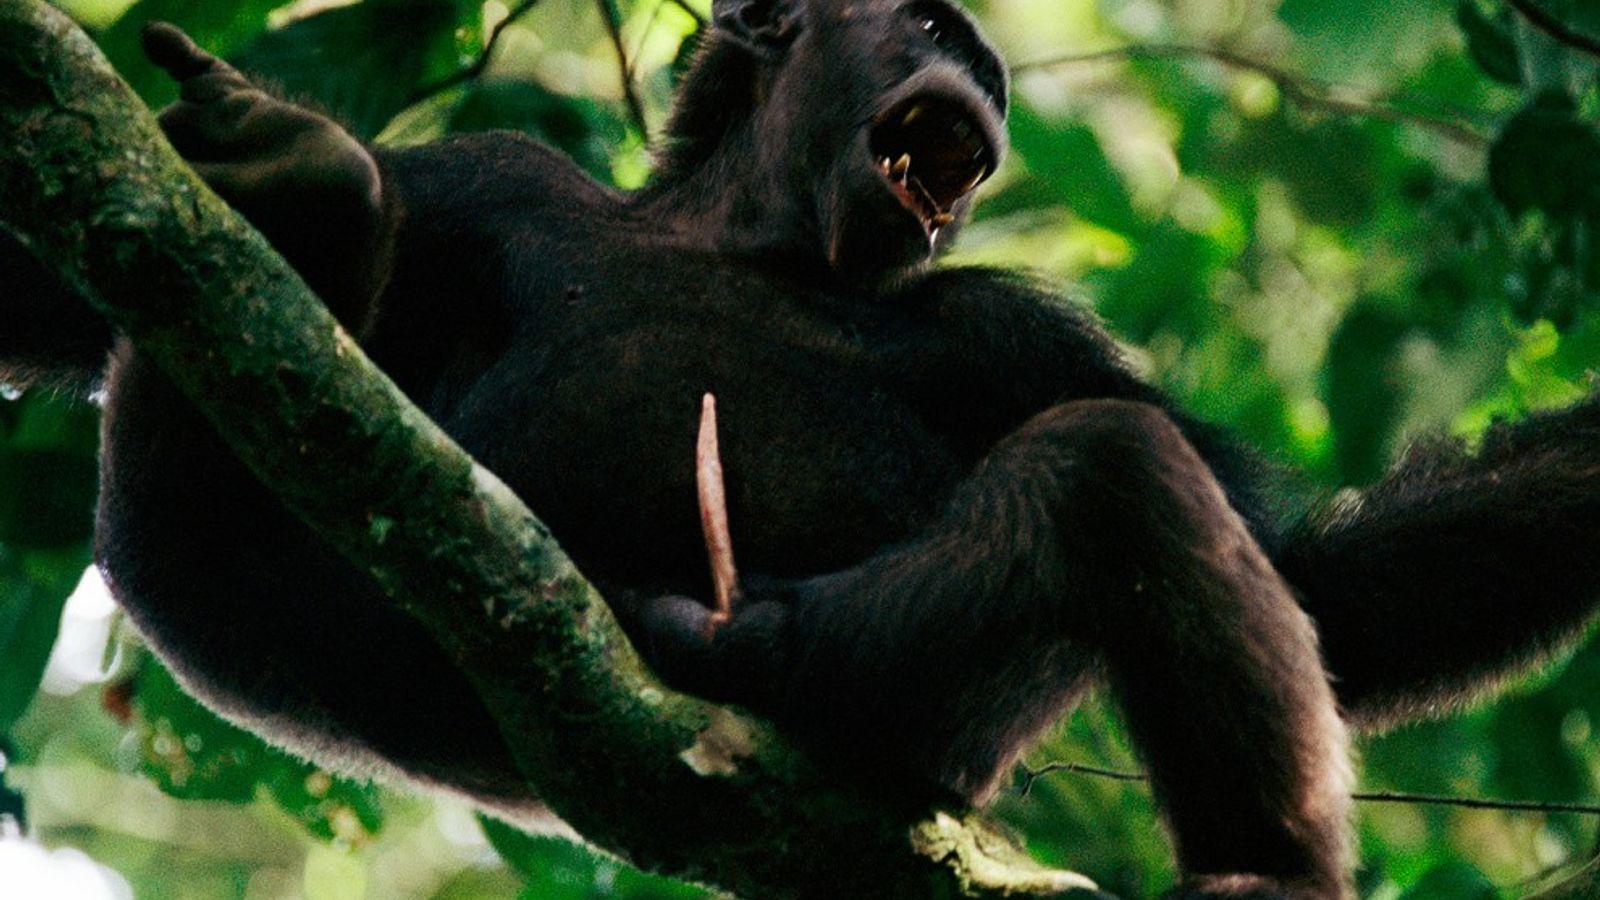 chimpanzee penile spines humans